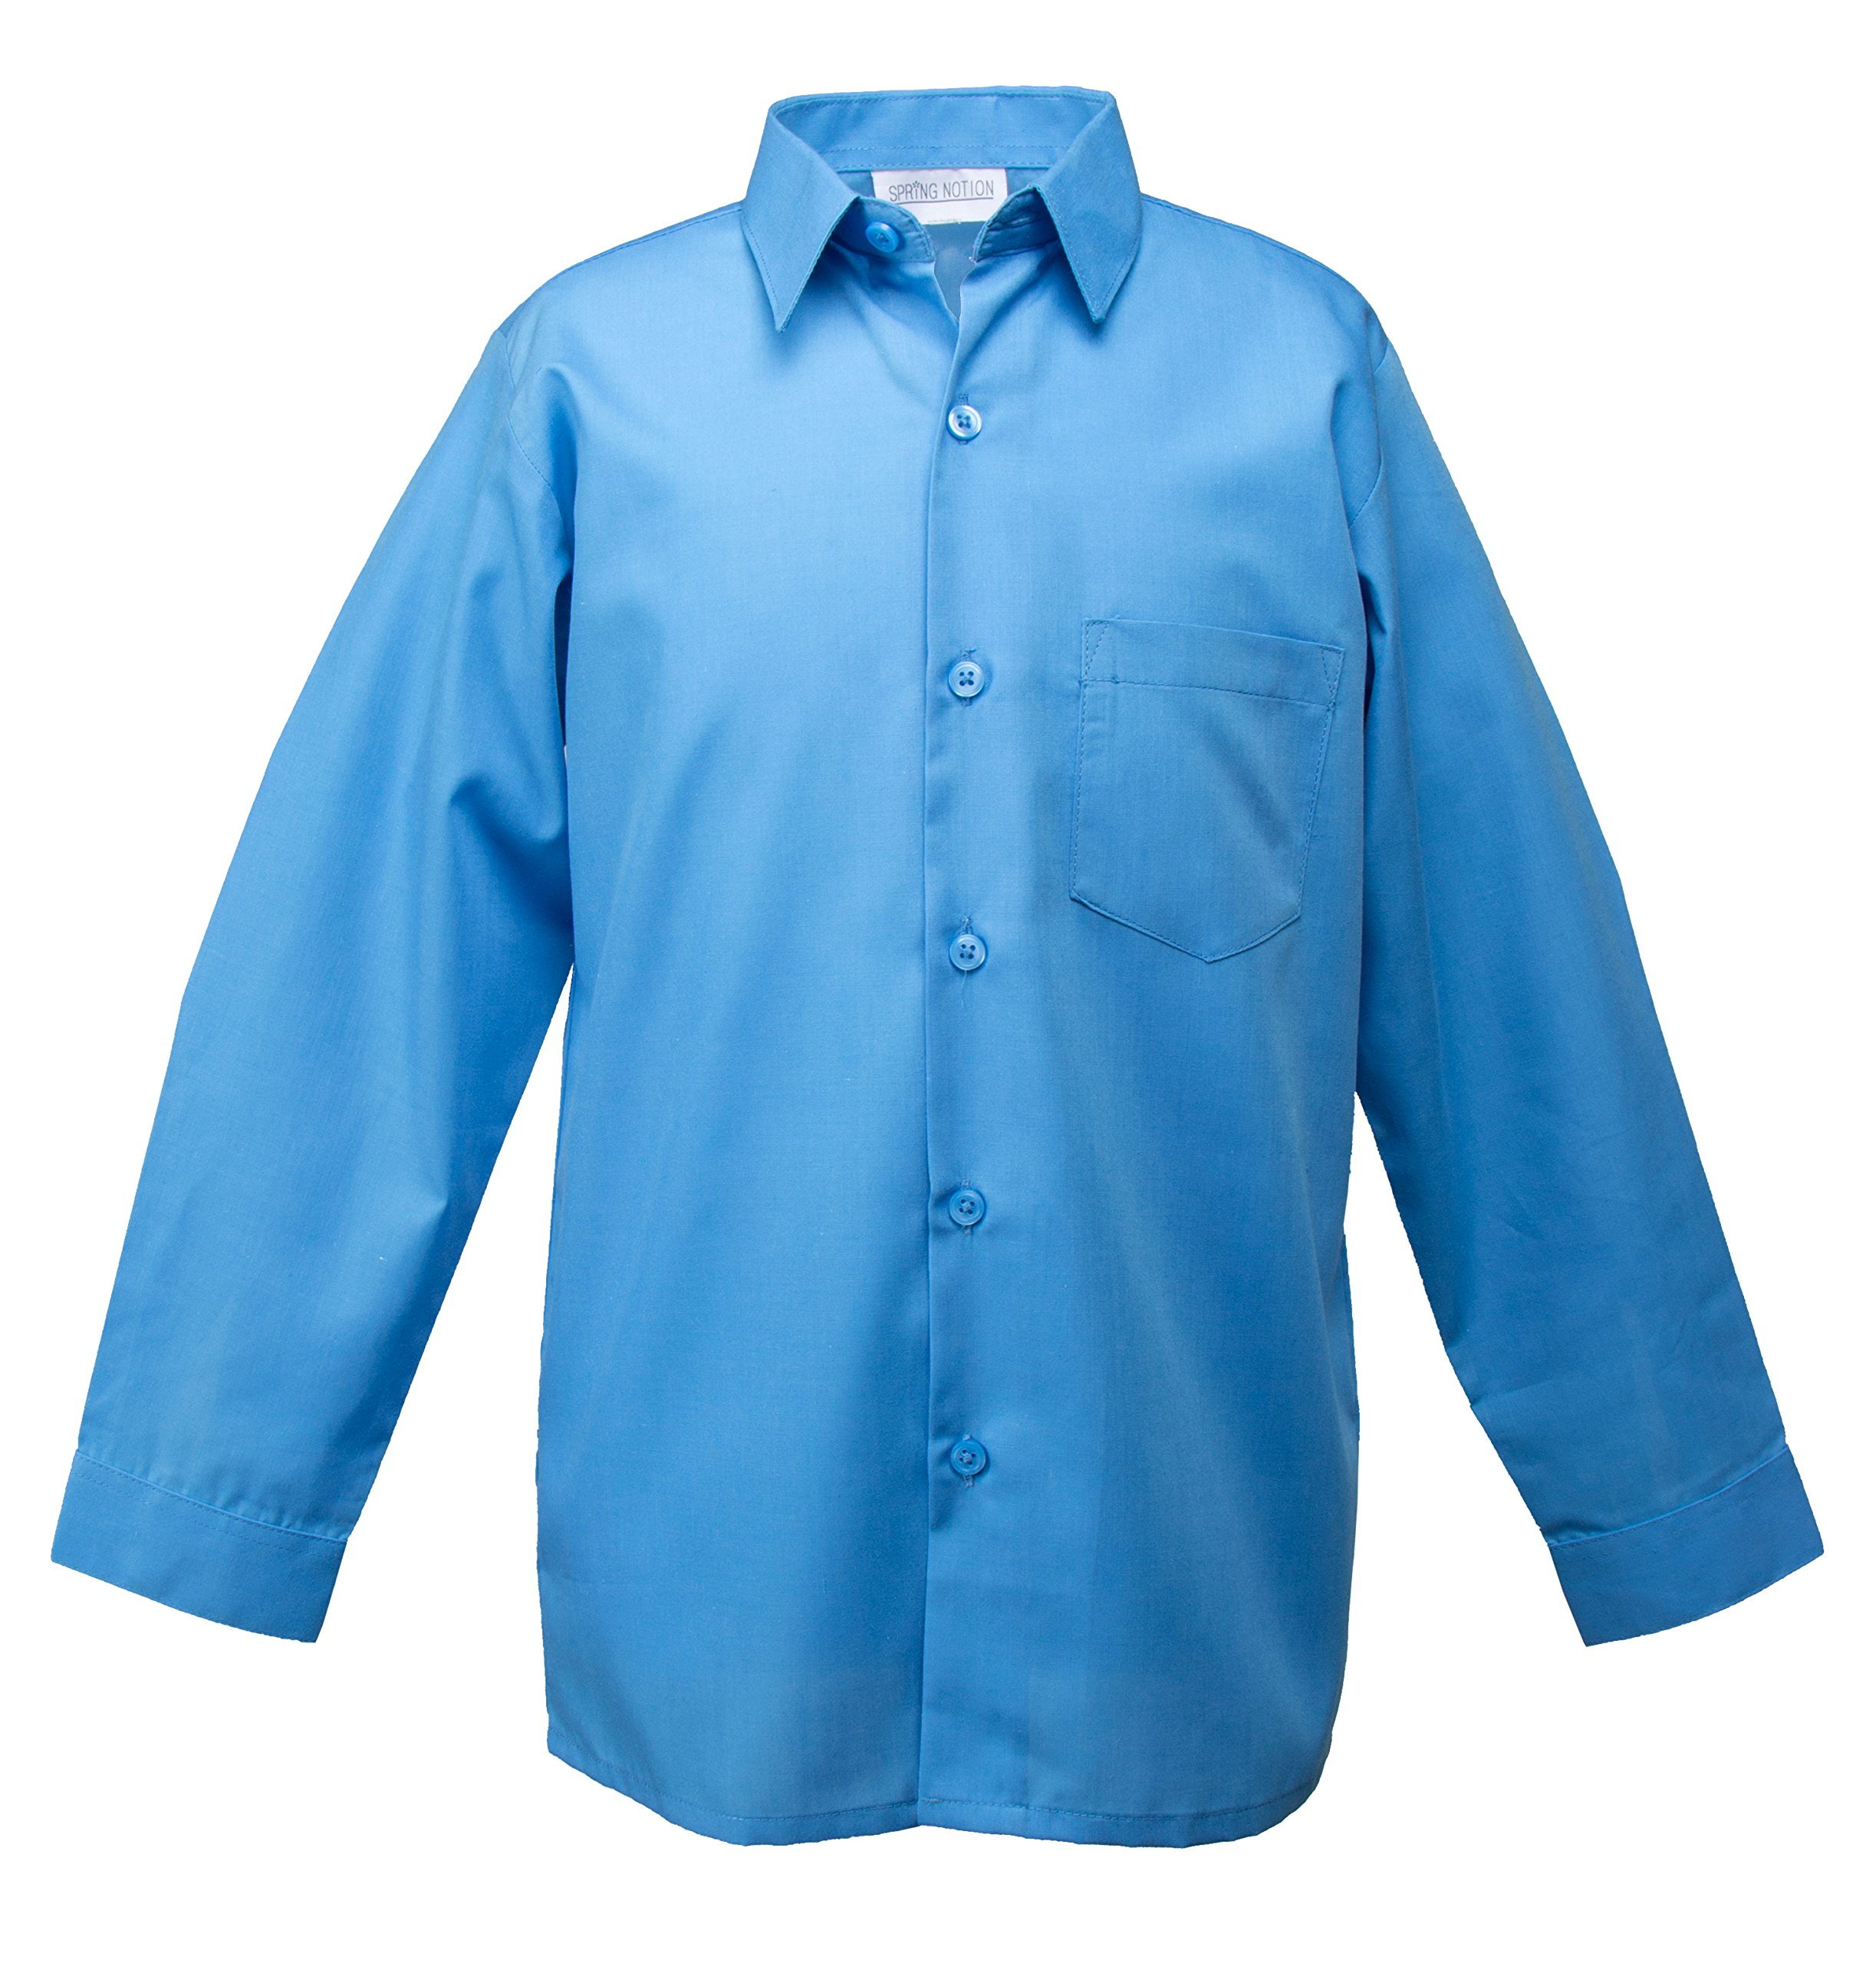 Spring Notion Big Boys' Long Sleeve Dress Shirt 12 Sky Blue